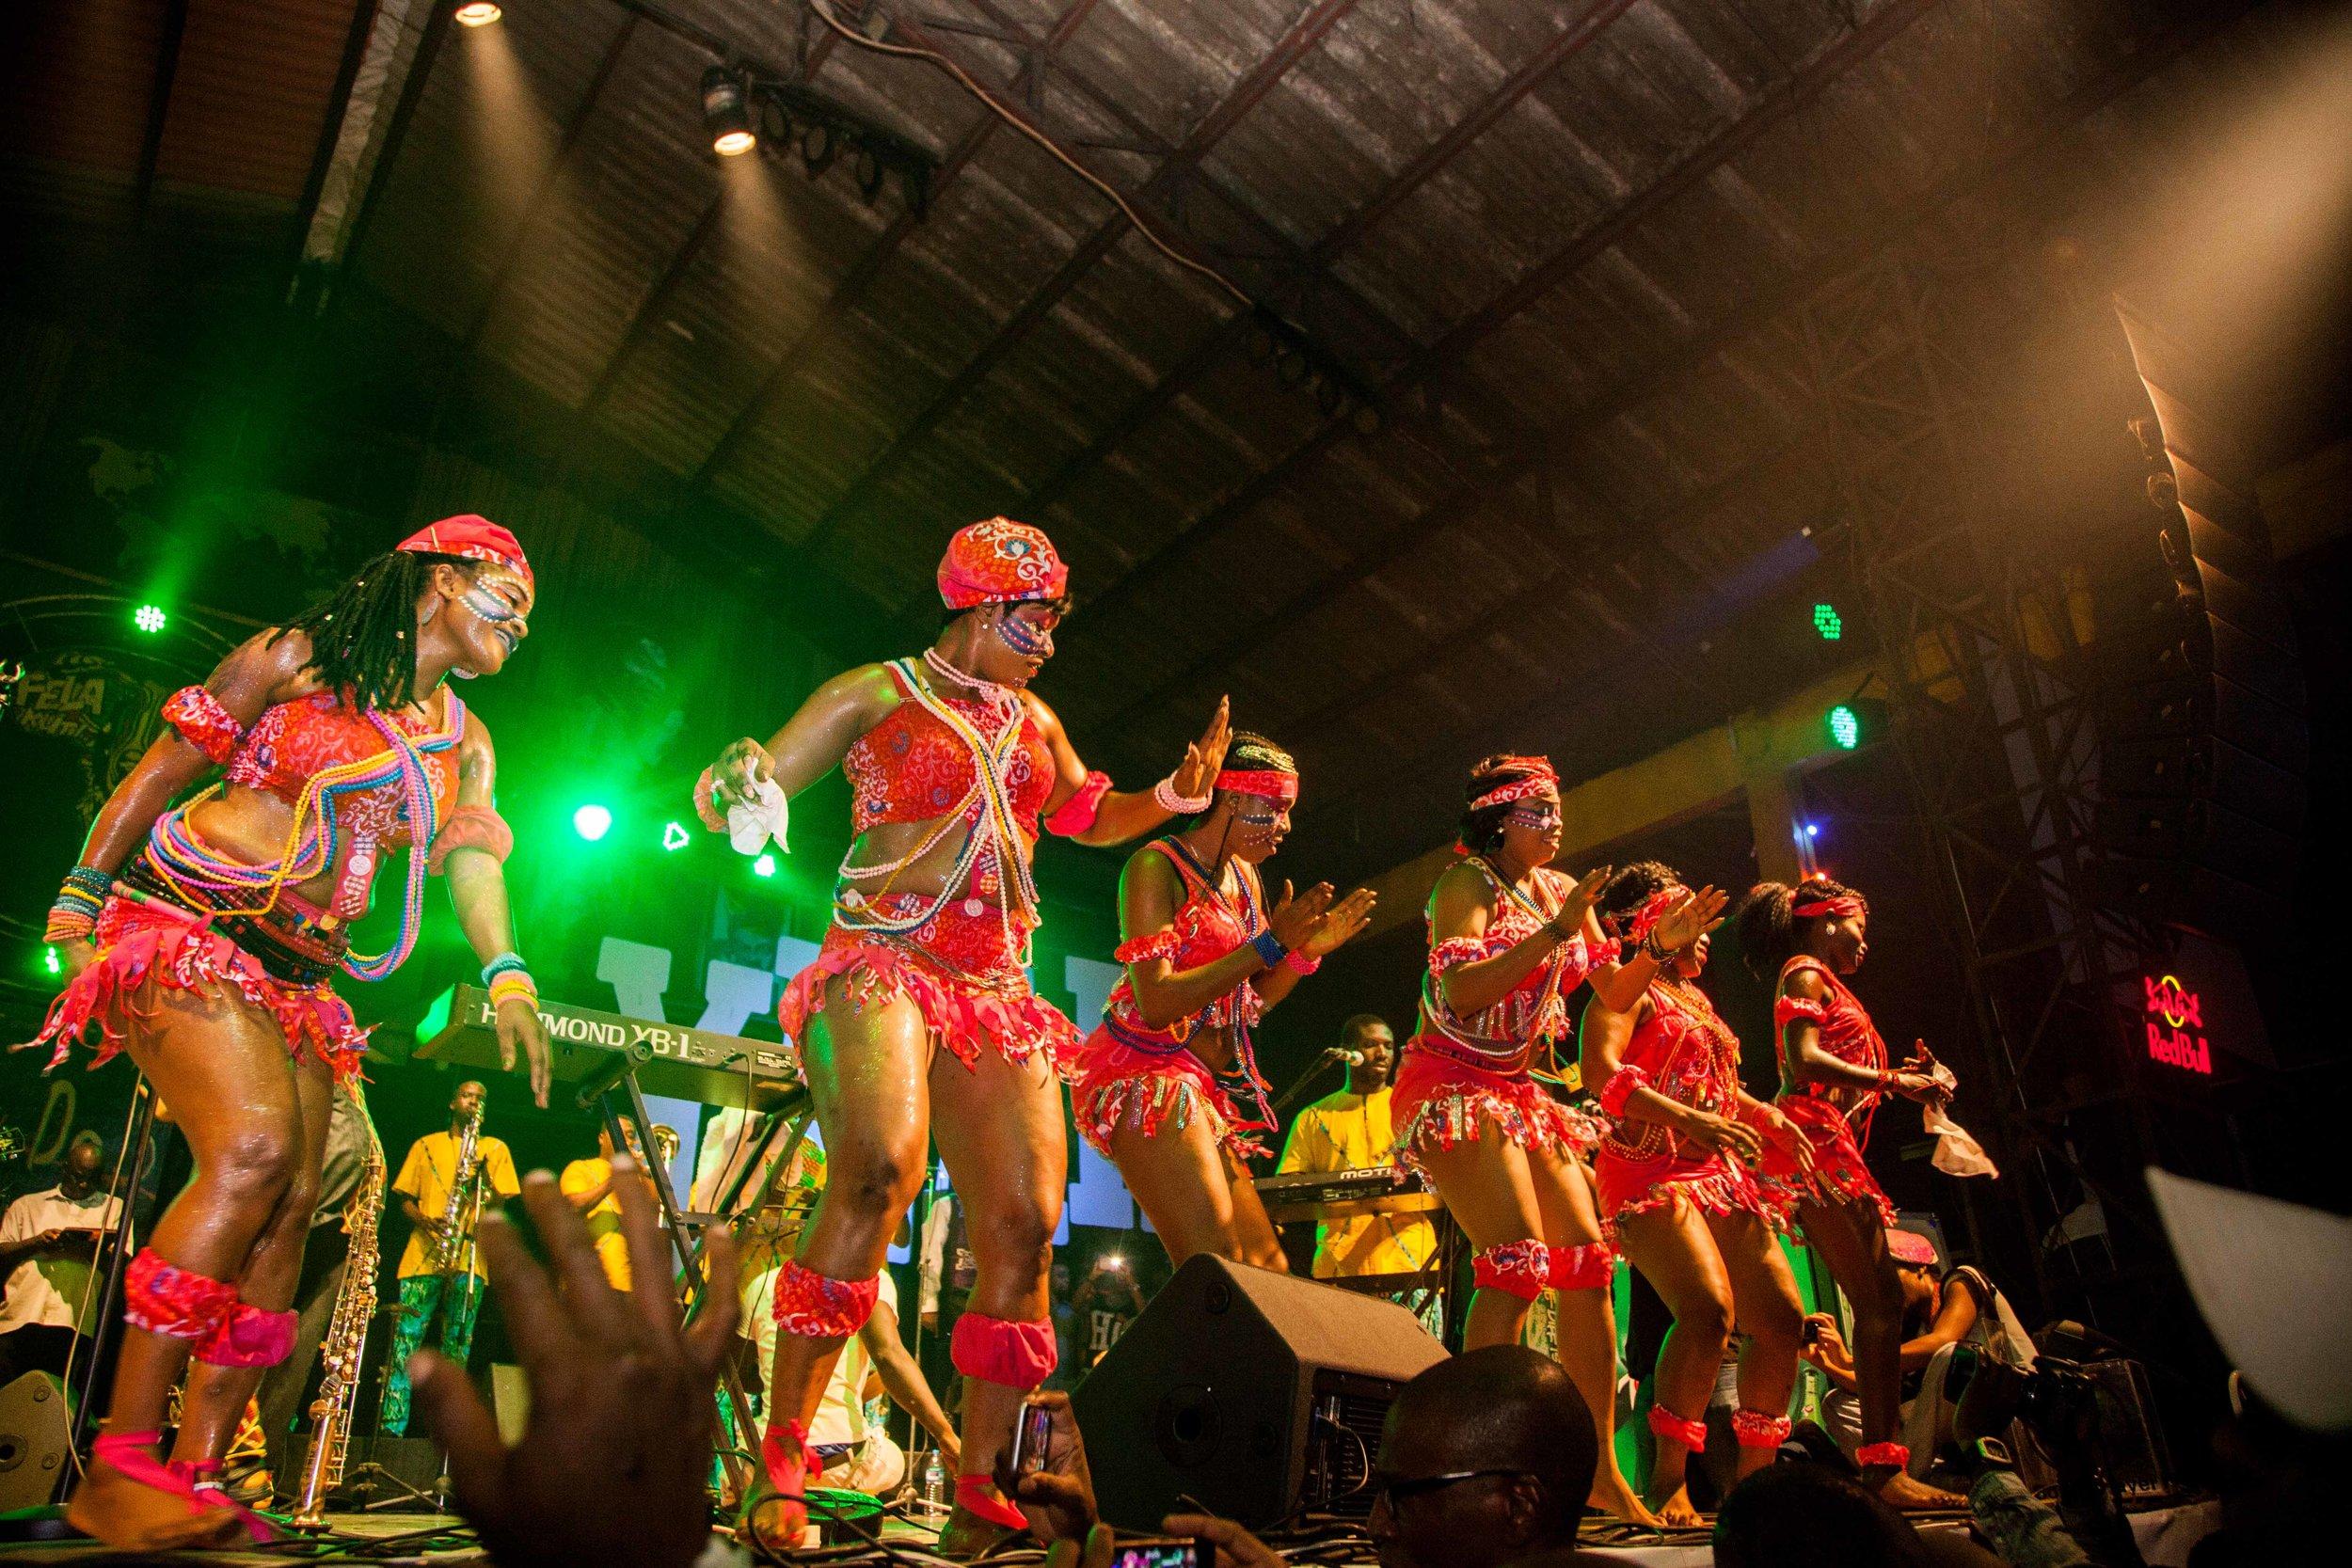 Dancers at the New Afrika Shrine // Source:http://thesoleadventurer.com/